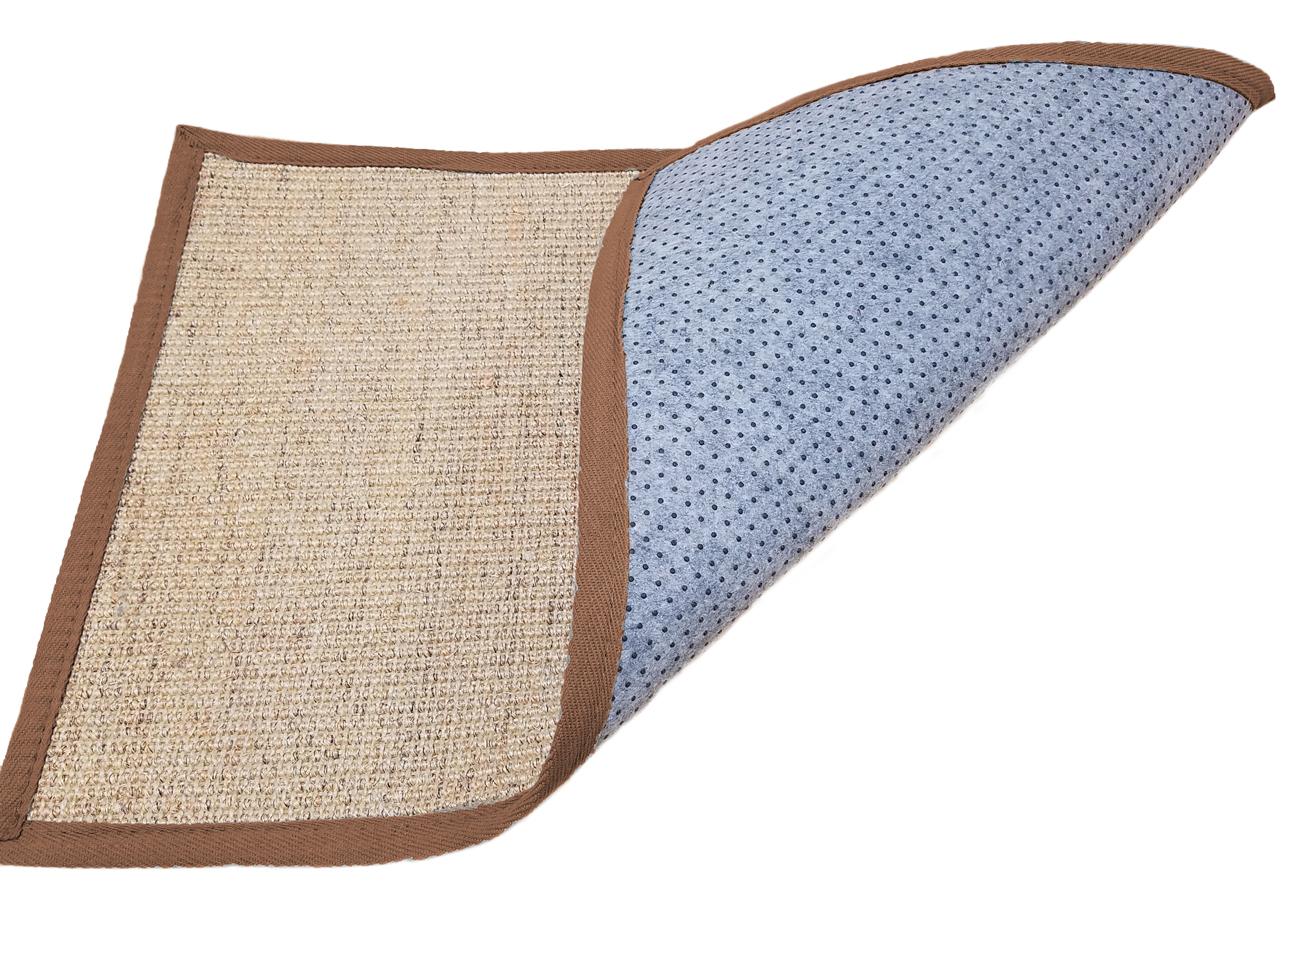 brown sisal seagrass area rug bordered natural fiber casual accent carpet rugs ebay. Black Bedroom Furniture Sets. Home Design Ideas